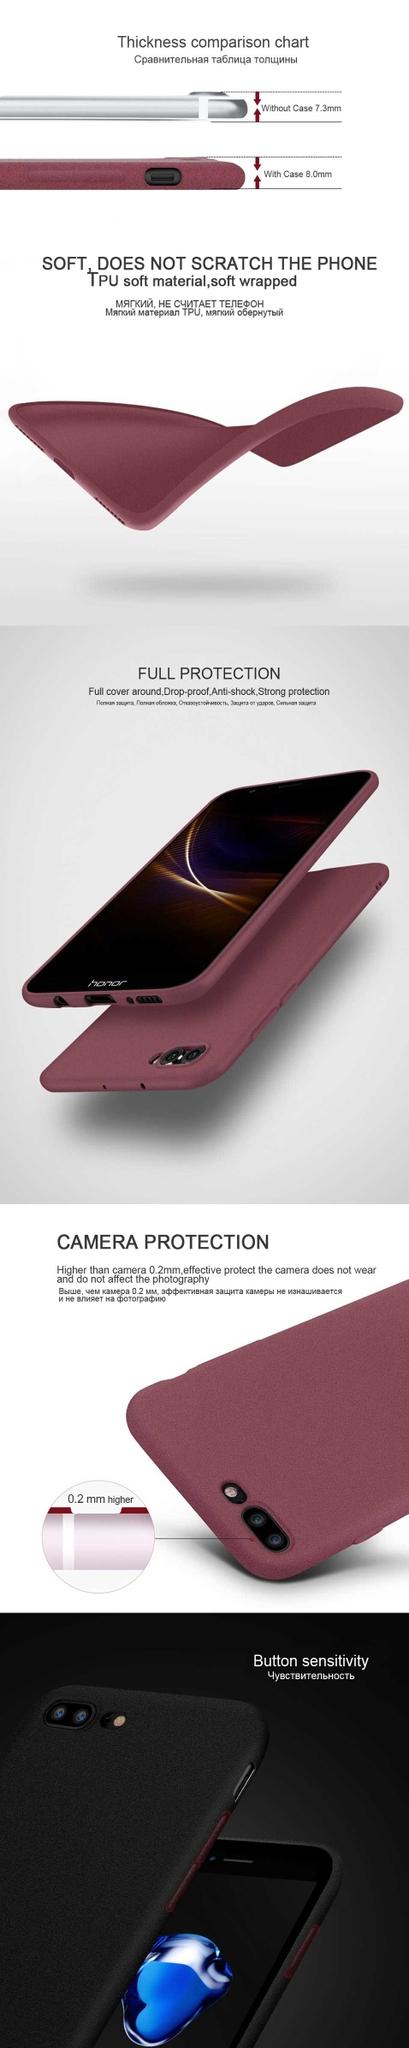 Silicone Soft TPU Matte Case for Huawei P20 P10 Lite P20 Pro P10 P9 P8 Lite 2017 P Smart Nova 2 Plus 2i 2s Case Cover Phone Bag (13)